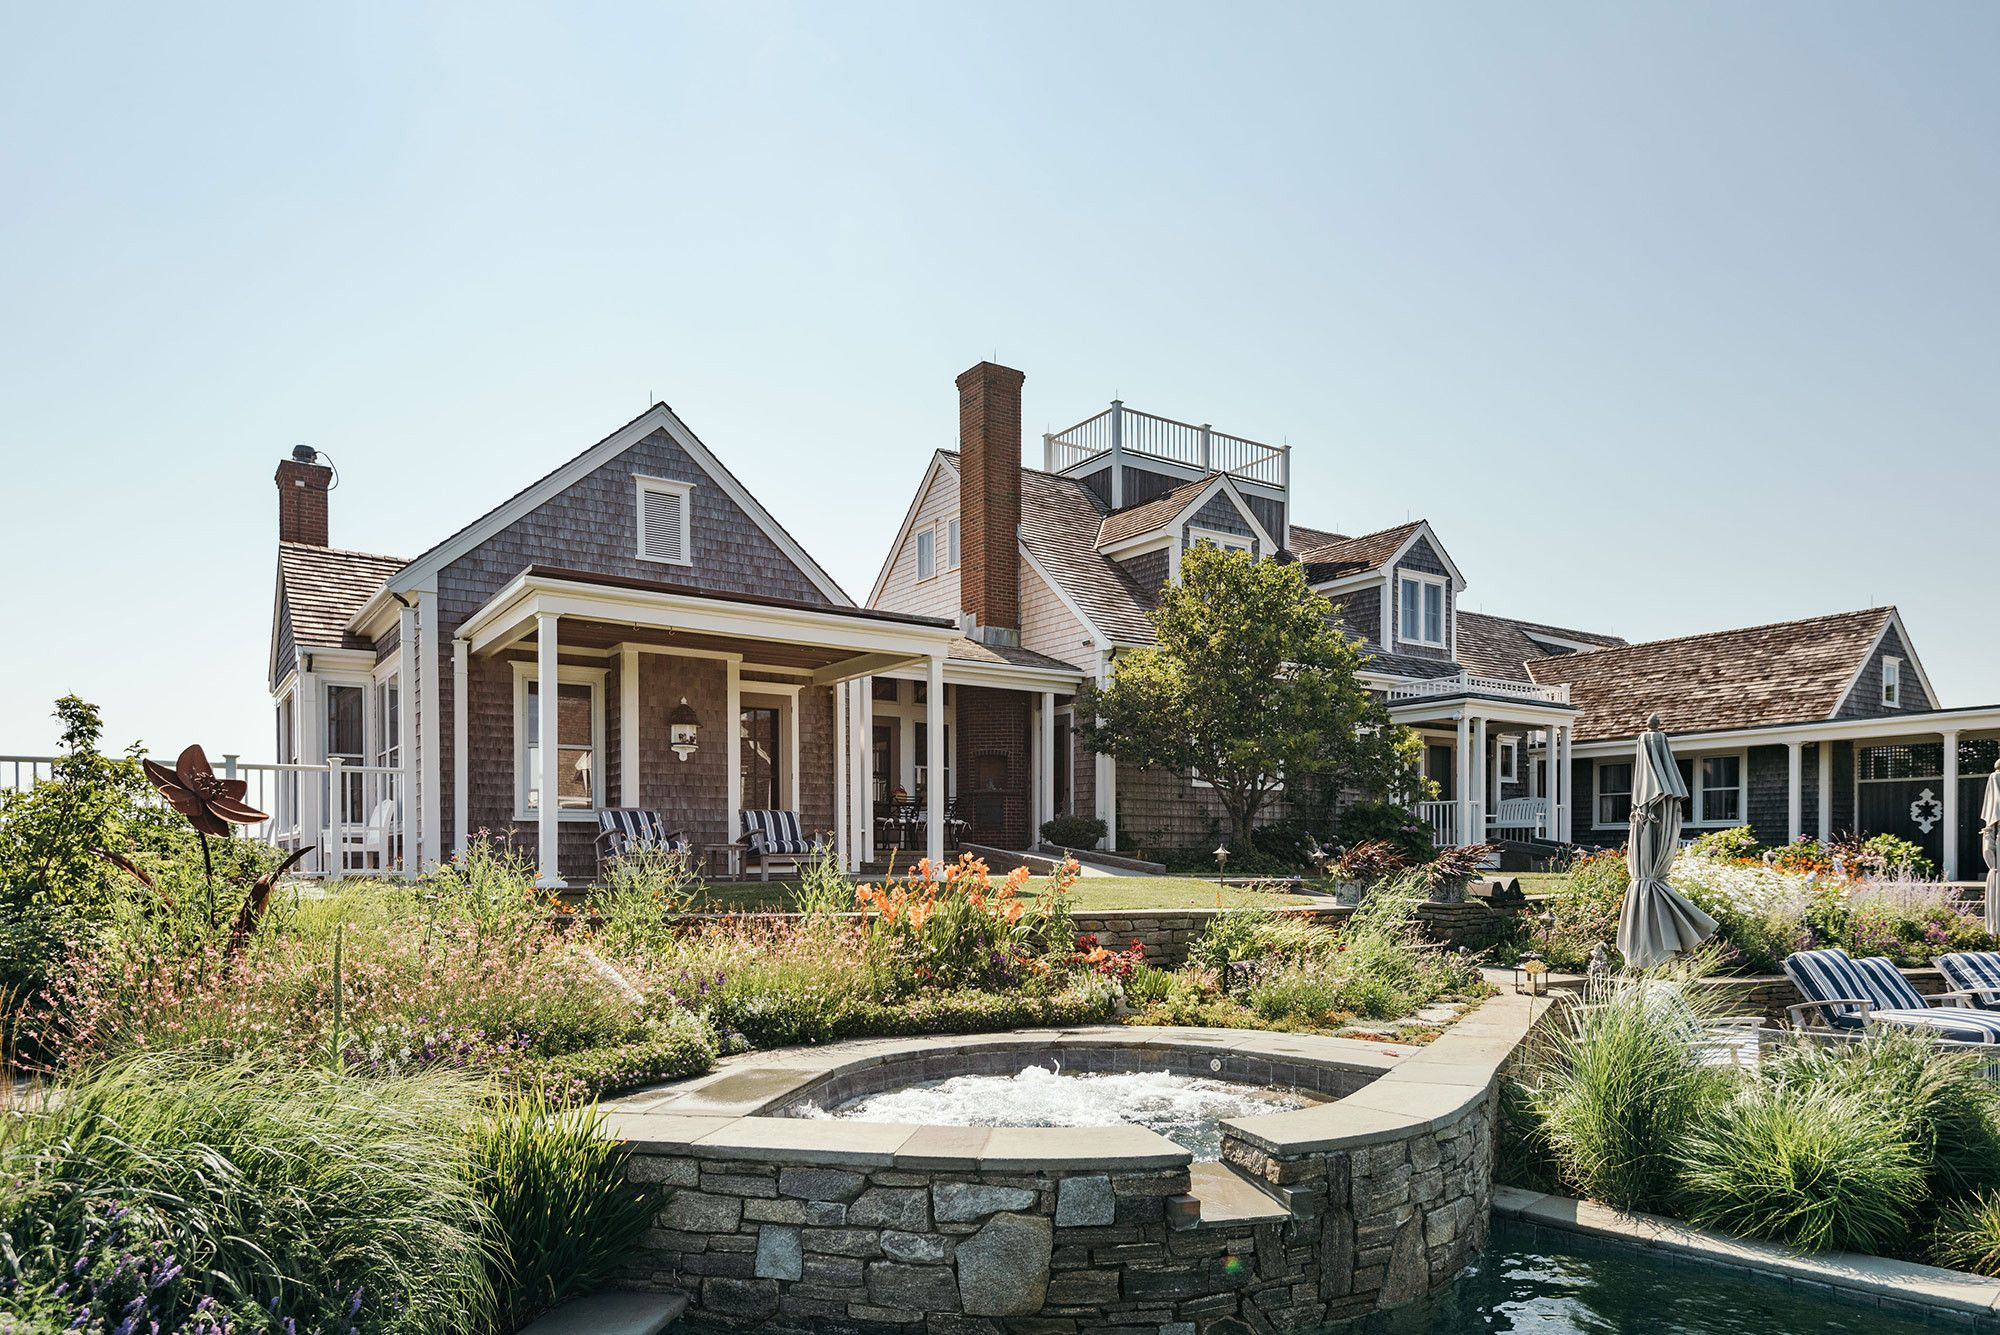 Kourtney Kardashian's Nantucket Vacation House | Vacation ...